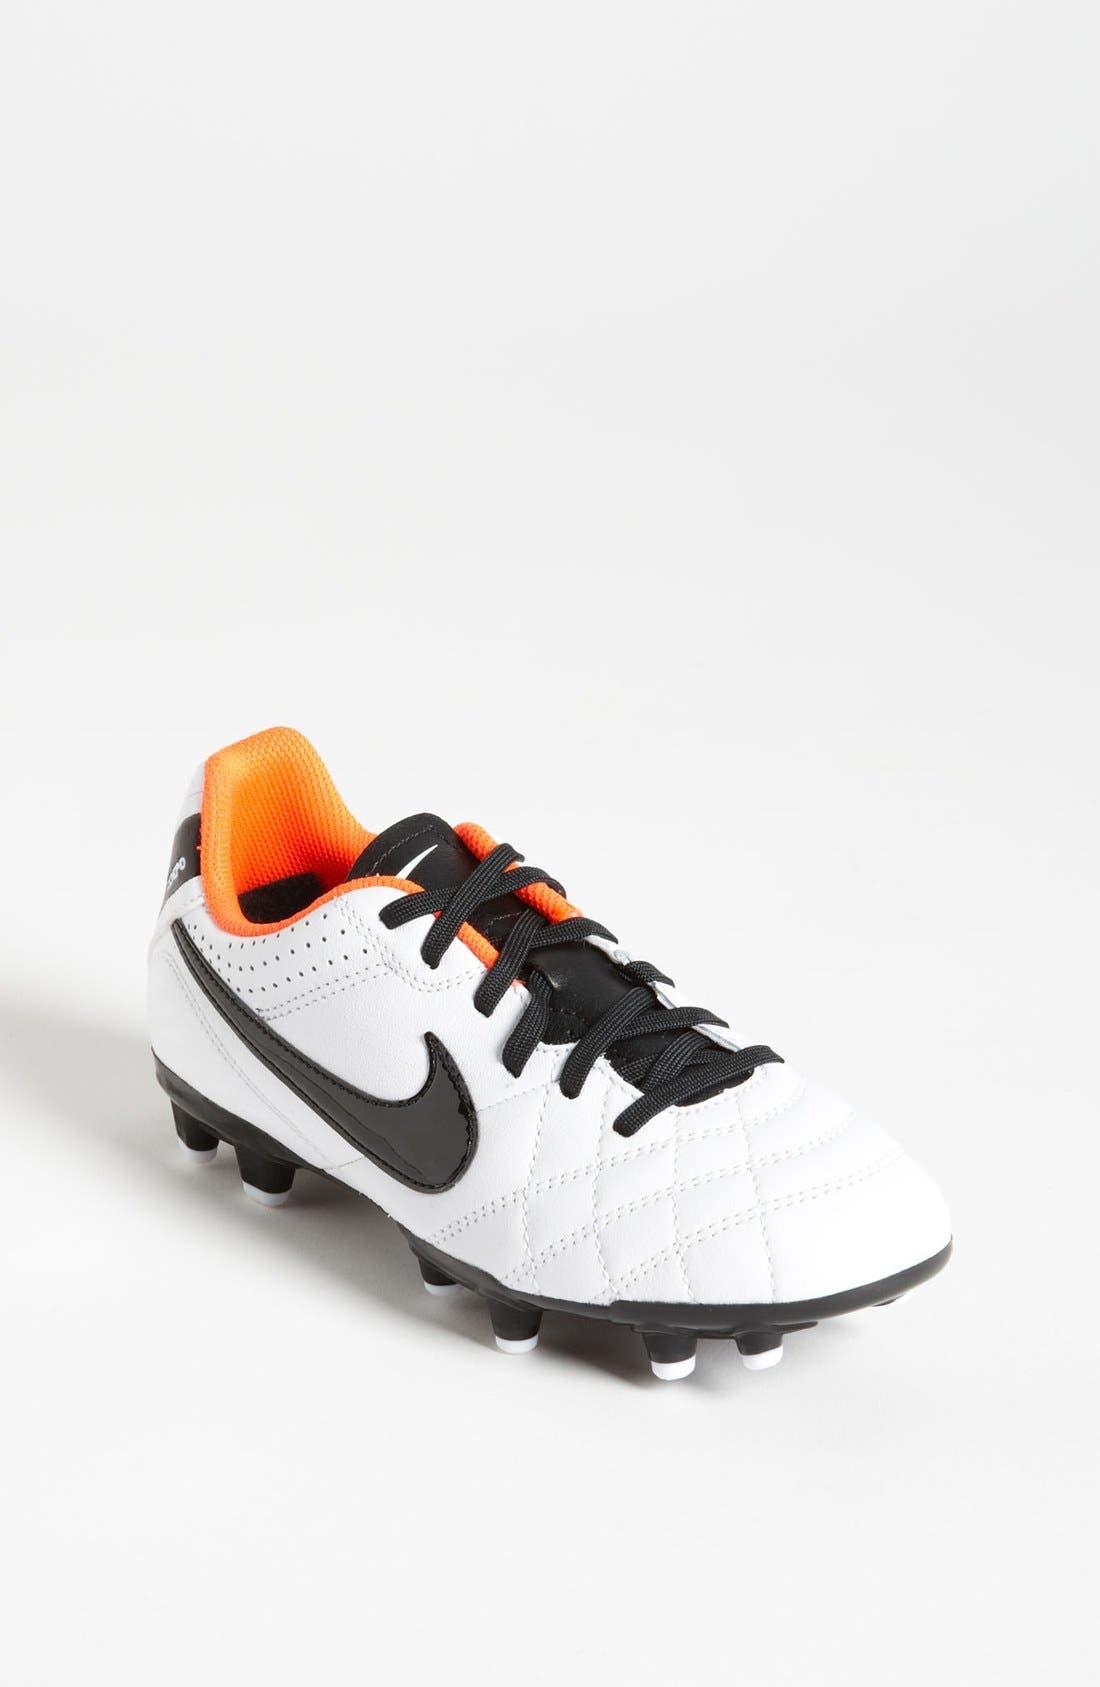 Main Image - Nike 'Tiempo Natural IV Jr.' Soccer Shoe (Little Kid & Big Kid)